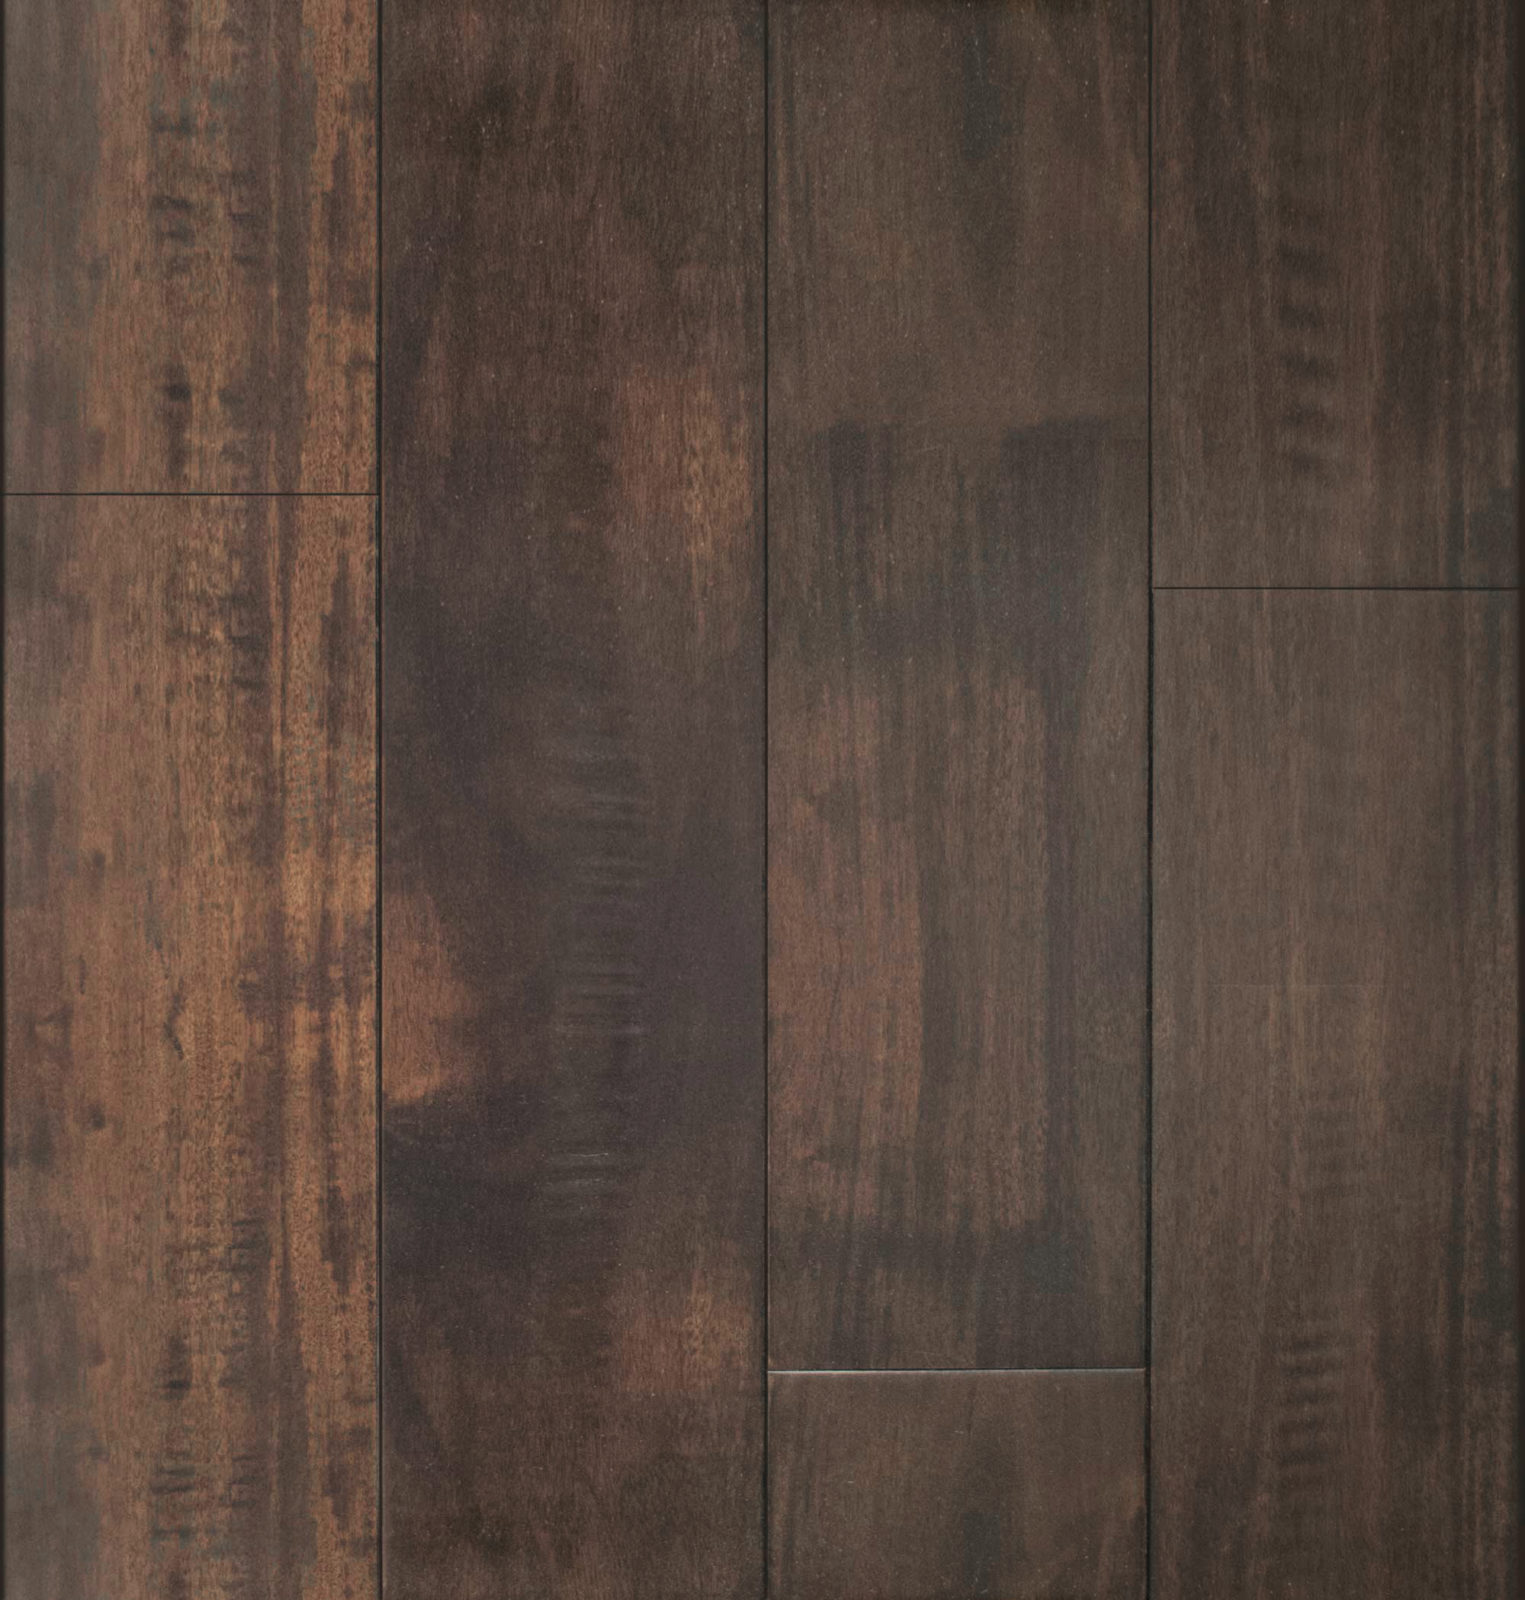 Small Leaf Acacia Walnut Hand Sed Flooring